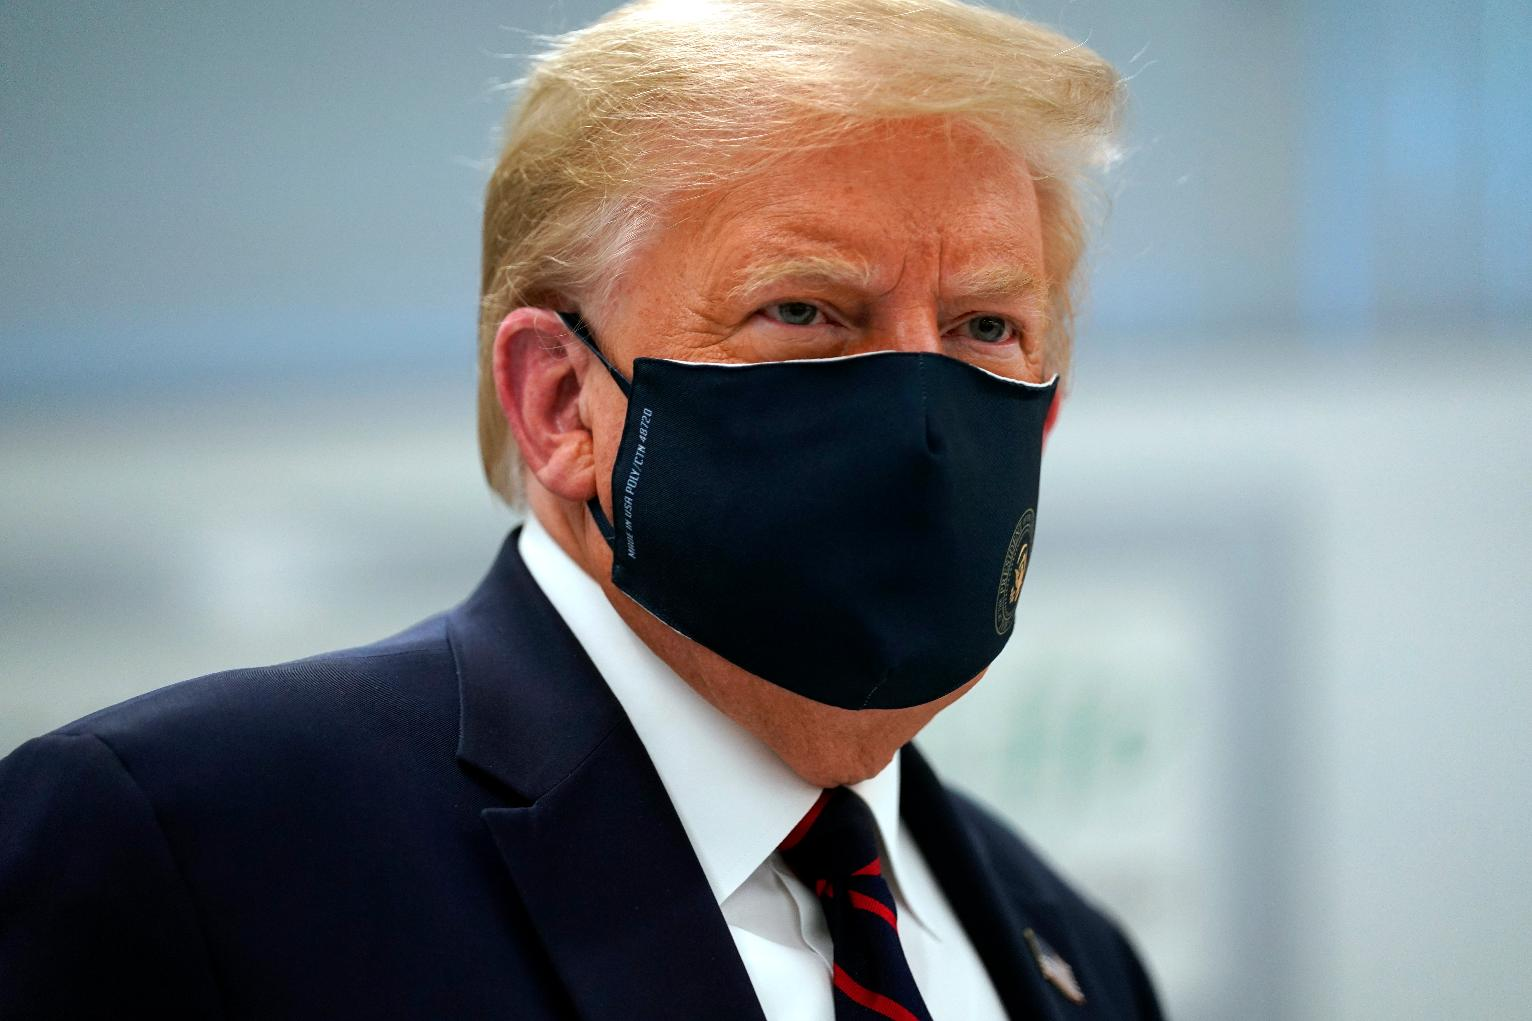 Trump Continues To Claim Drug Can Treat Coronavirus